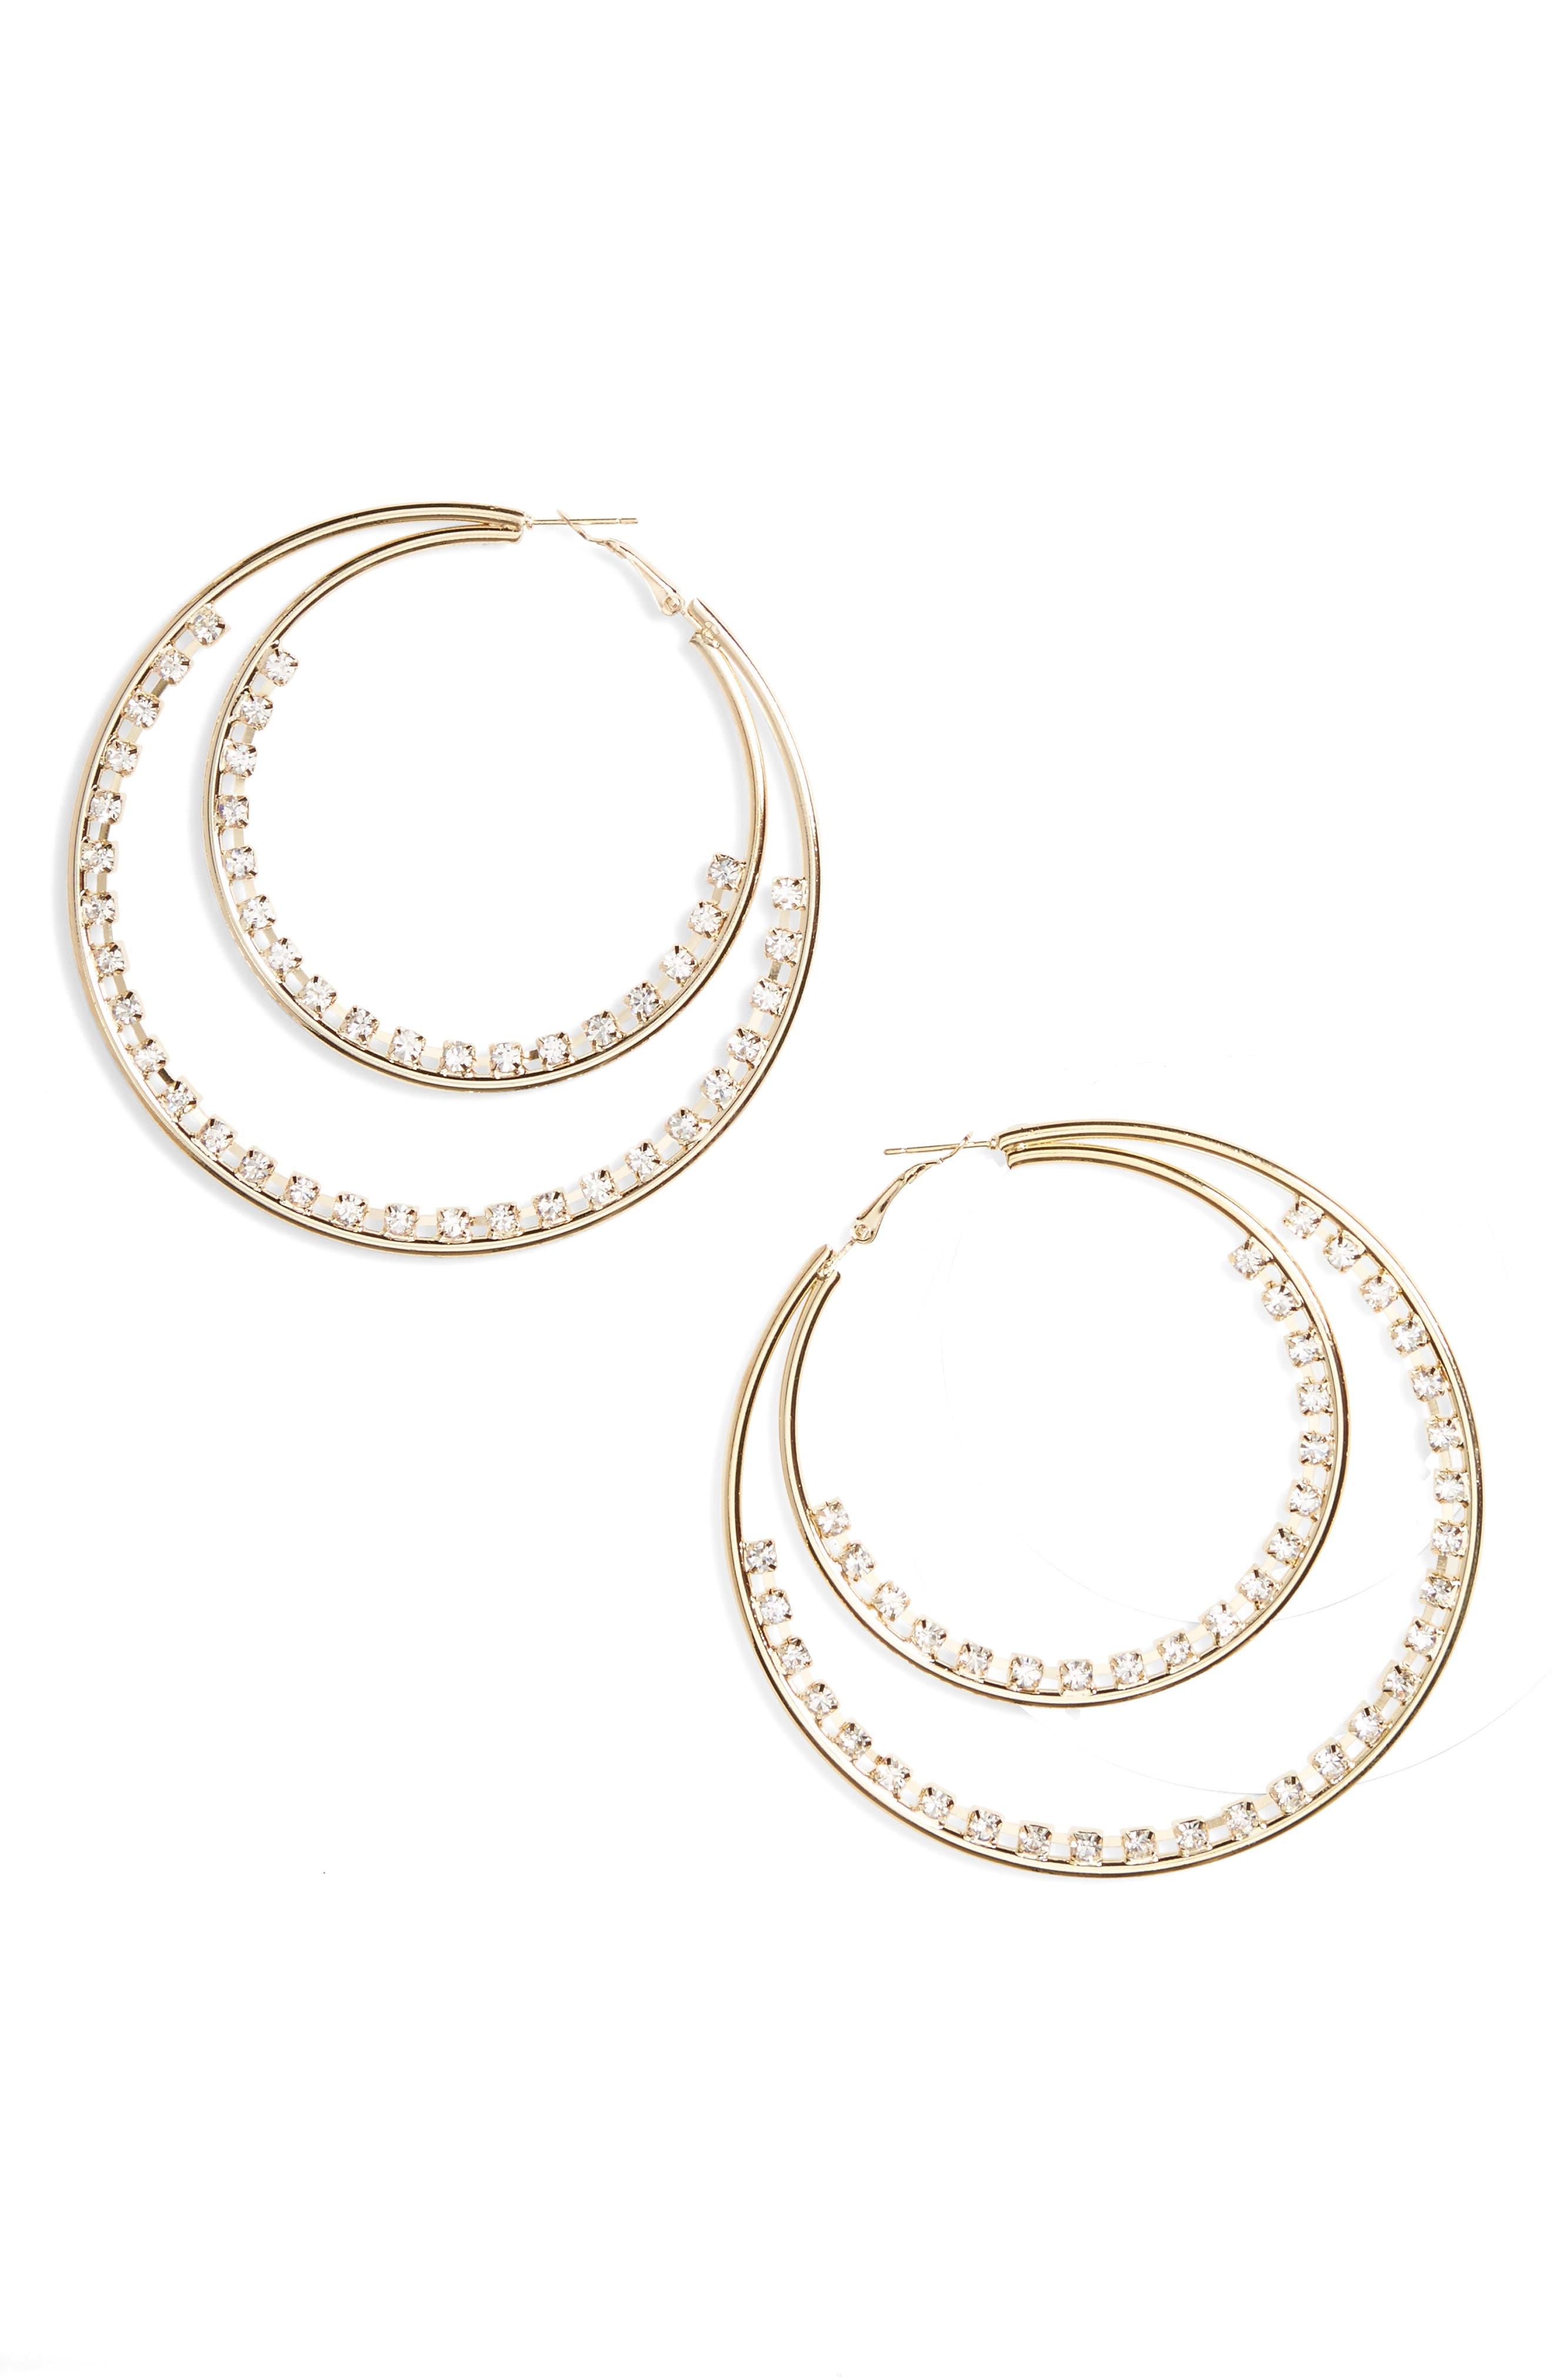 Alternate Image 1 Selected - Natasha Row Crystal Double Hoop Earrings